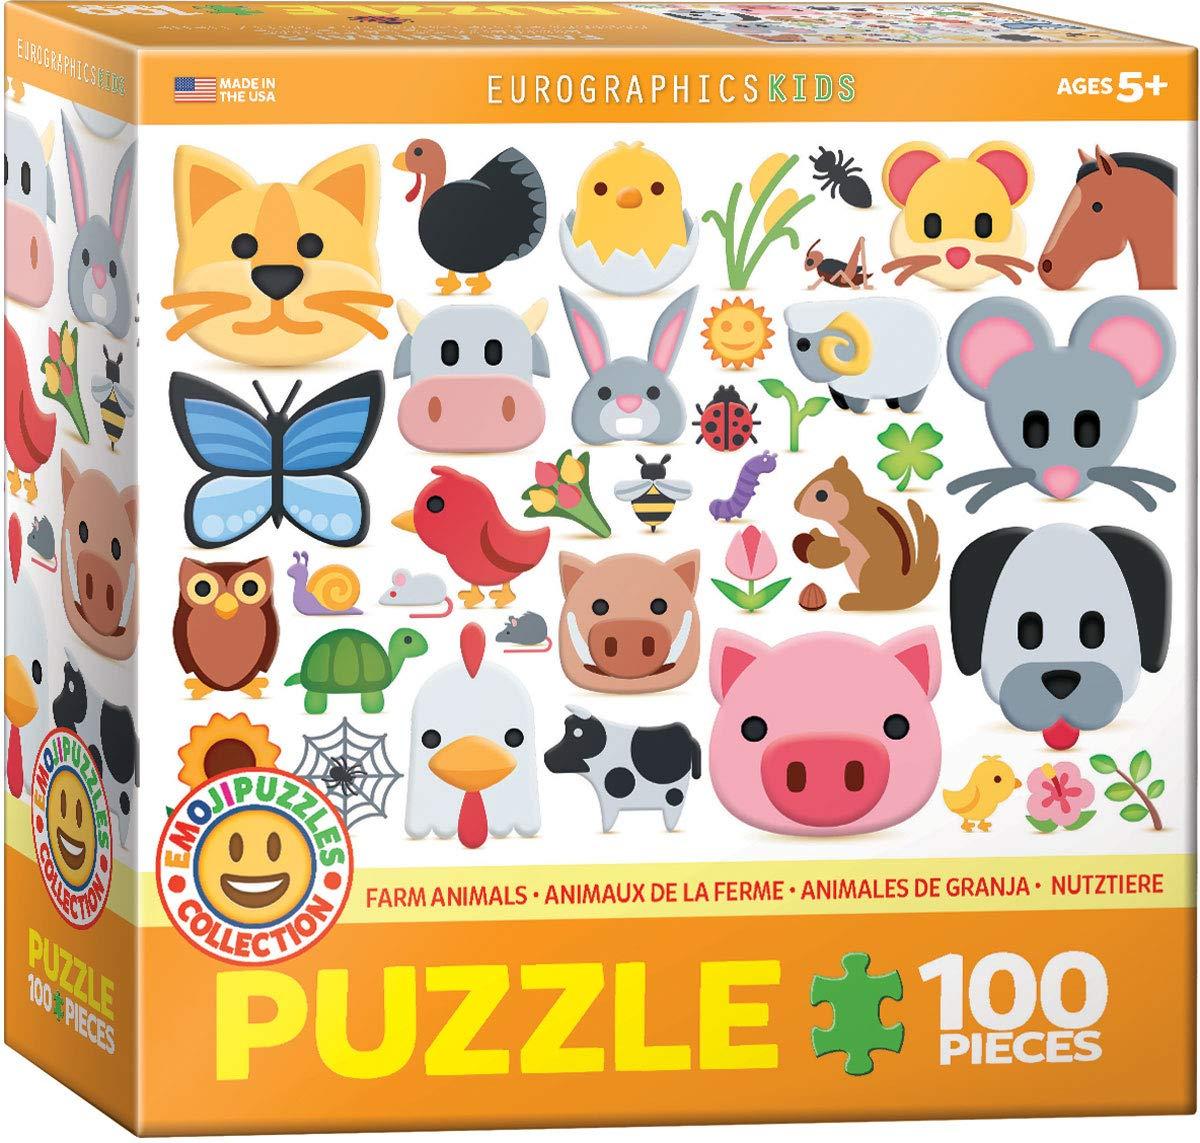 EuroGraphics Wildlife Animals Emoji Puzzle Jigsaw Puzzle 100-Piece